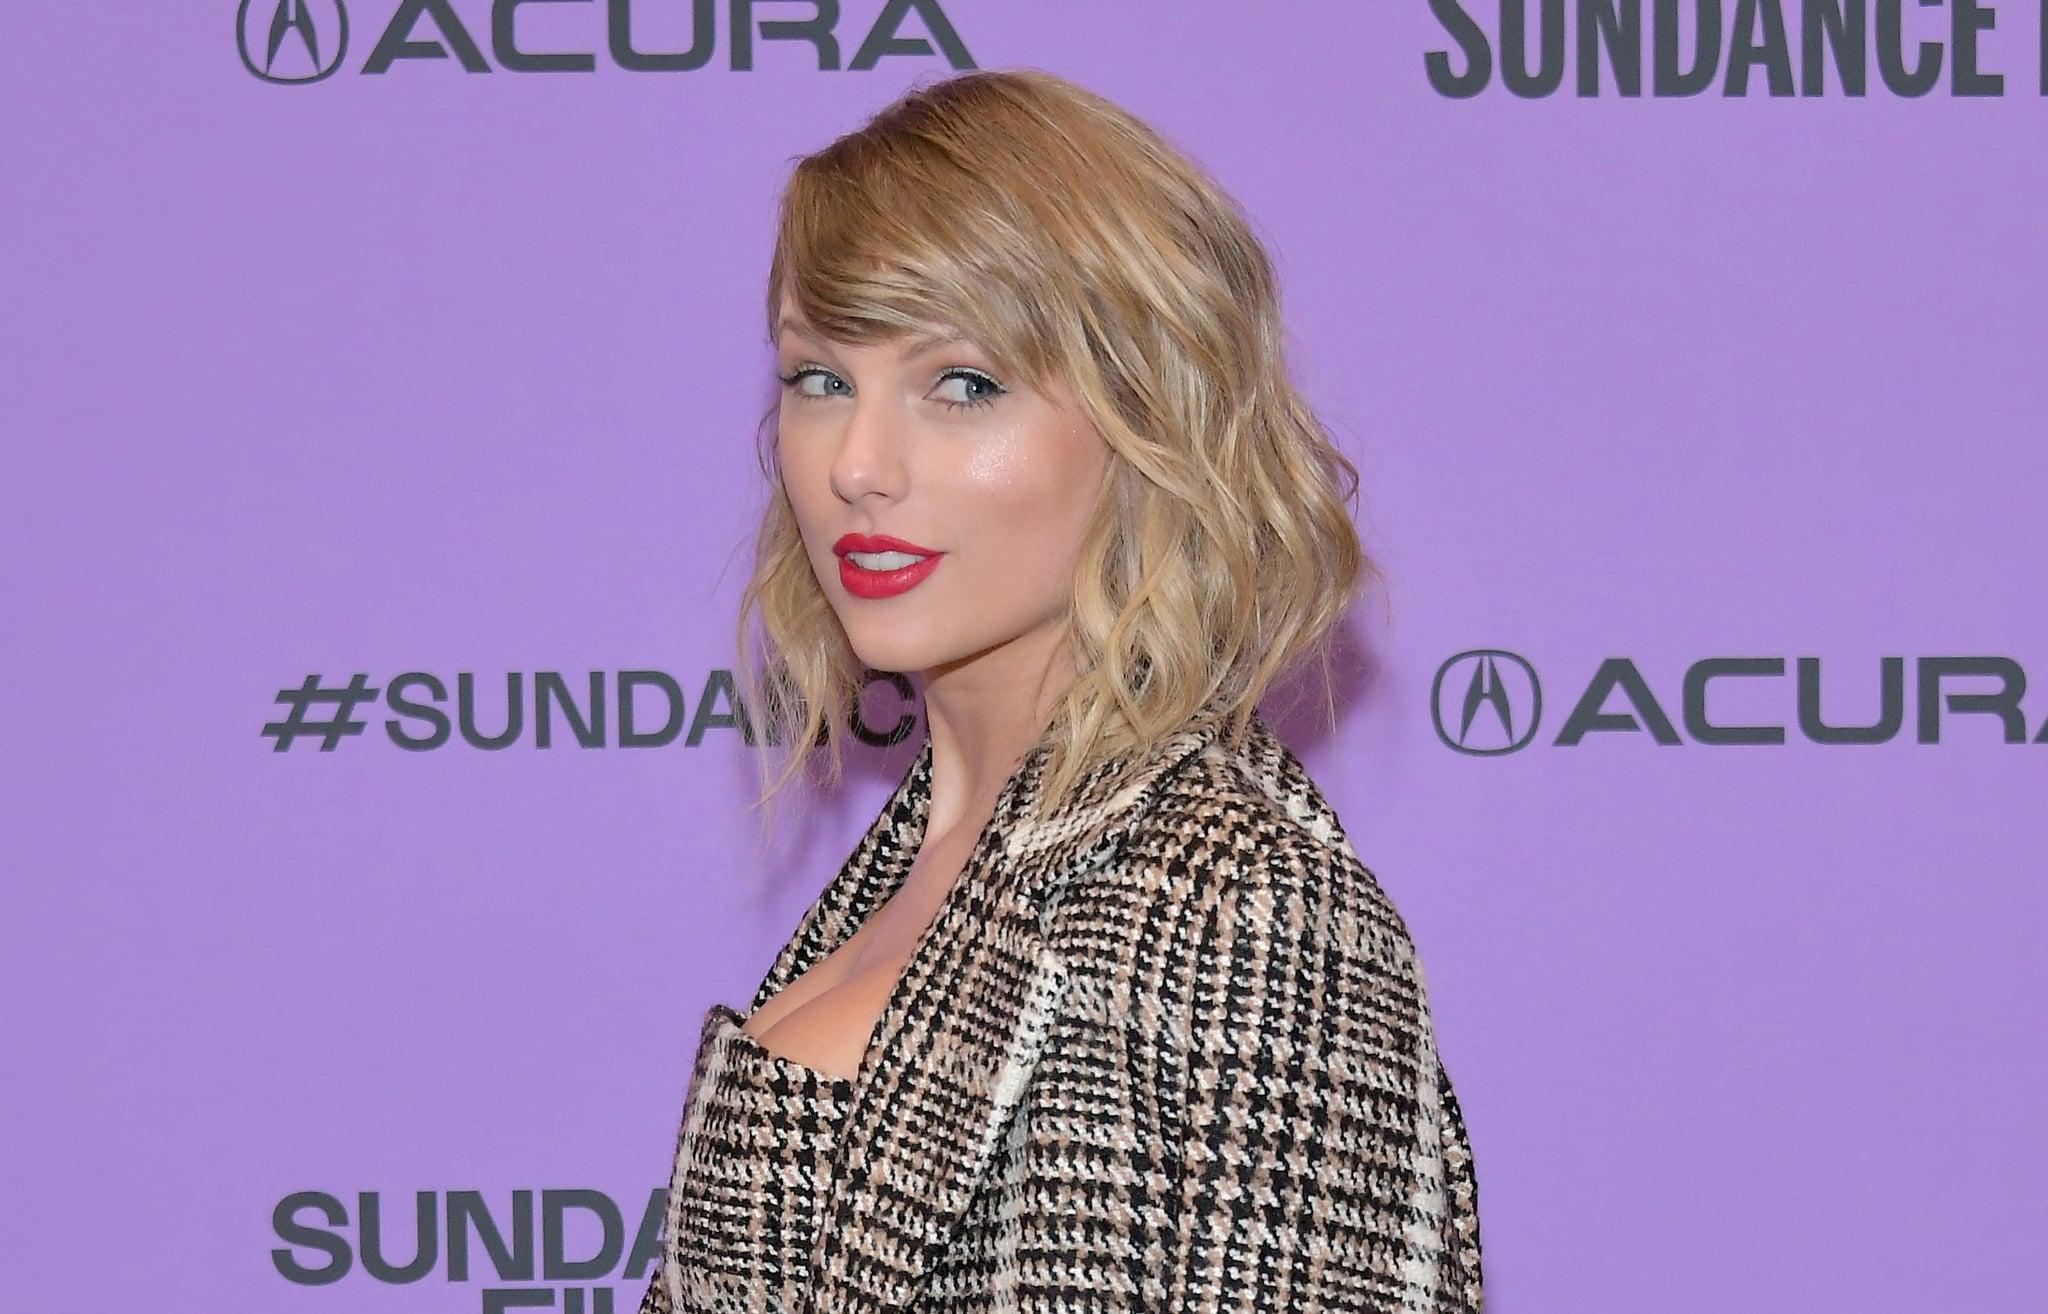 PARK CITY, UTAH - JANUARY 23: Taylor Swift attends the 2020 Sundance Film Festival -